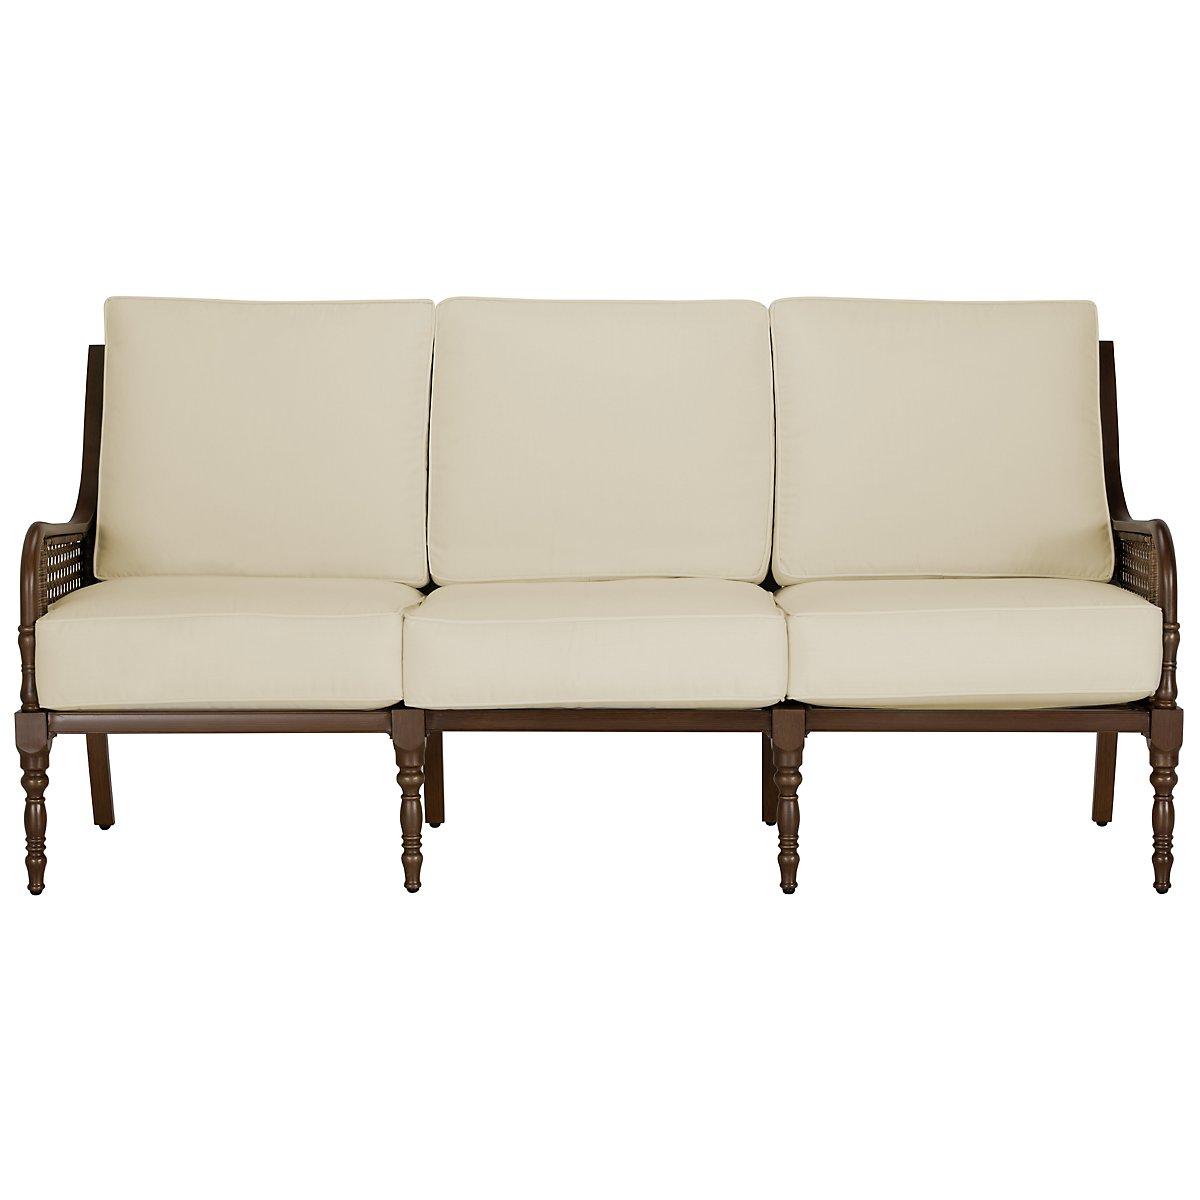 Tradewinds Dark Tone Sofa